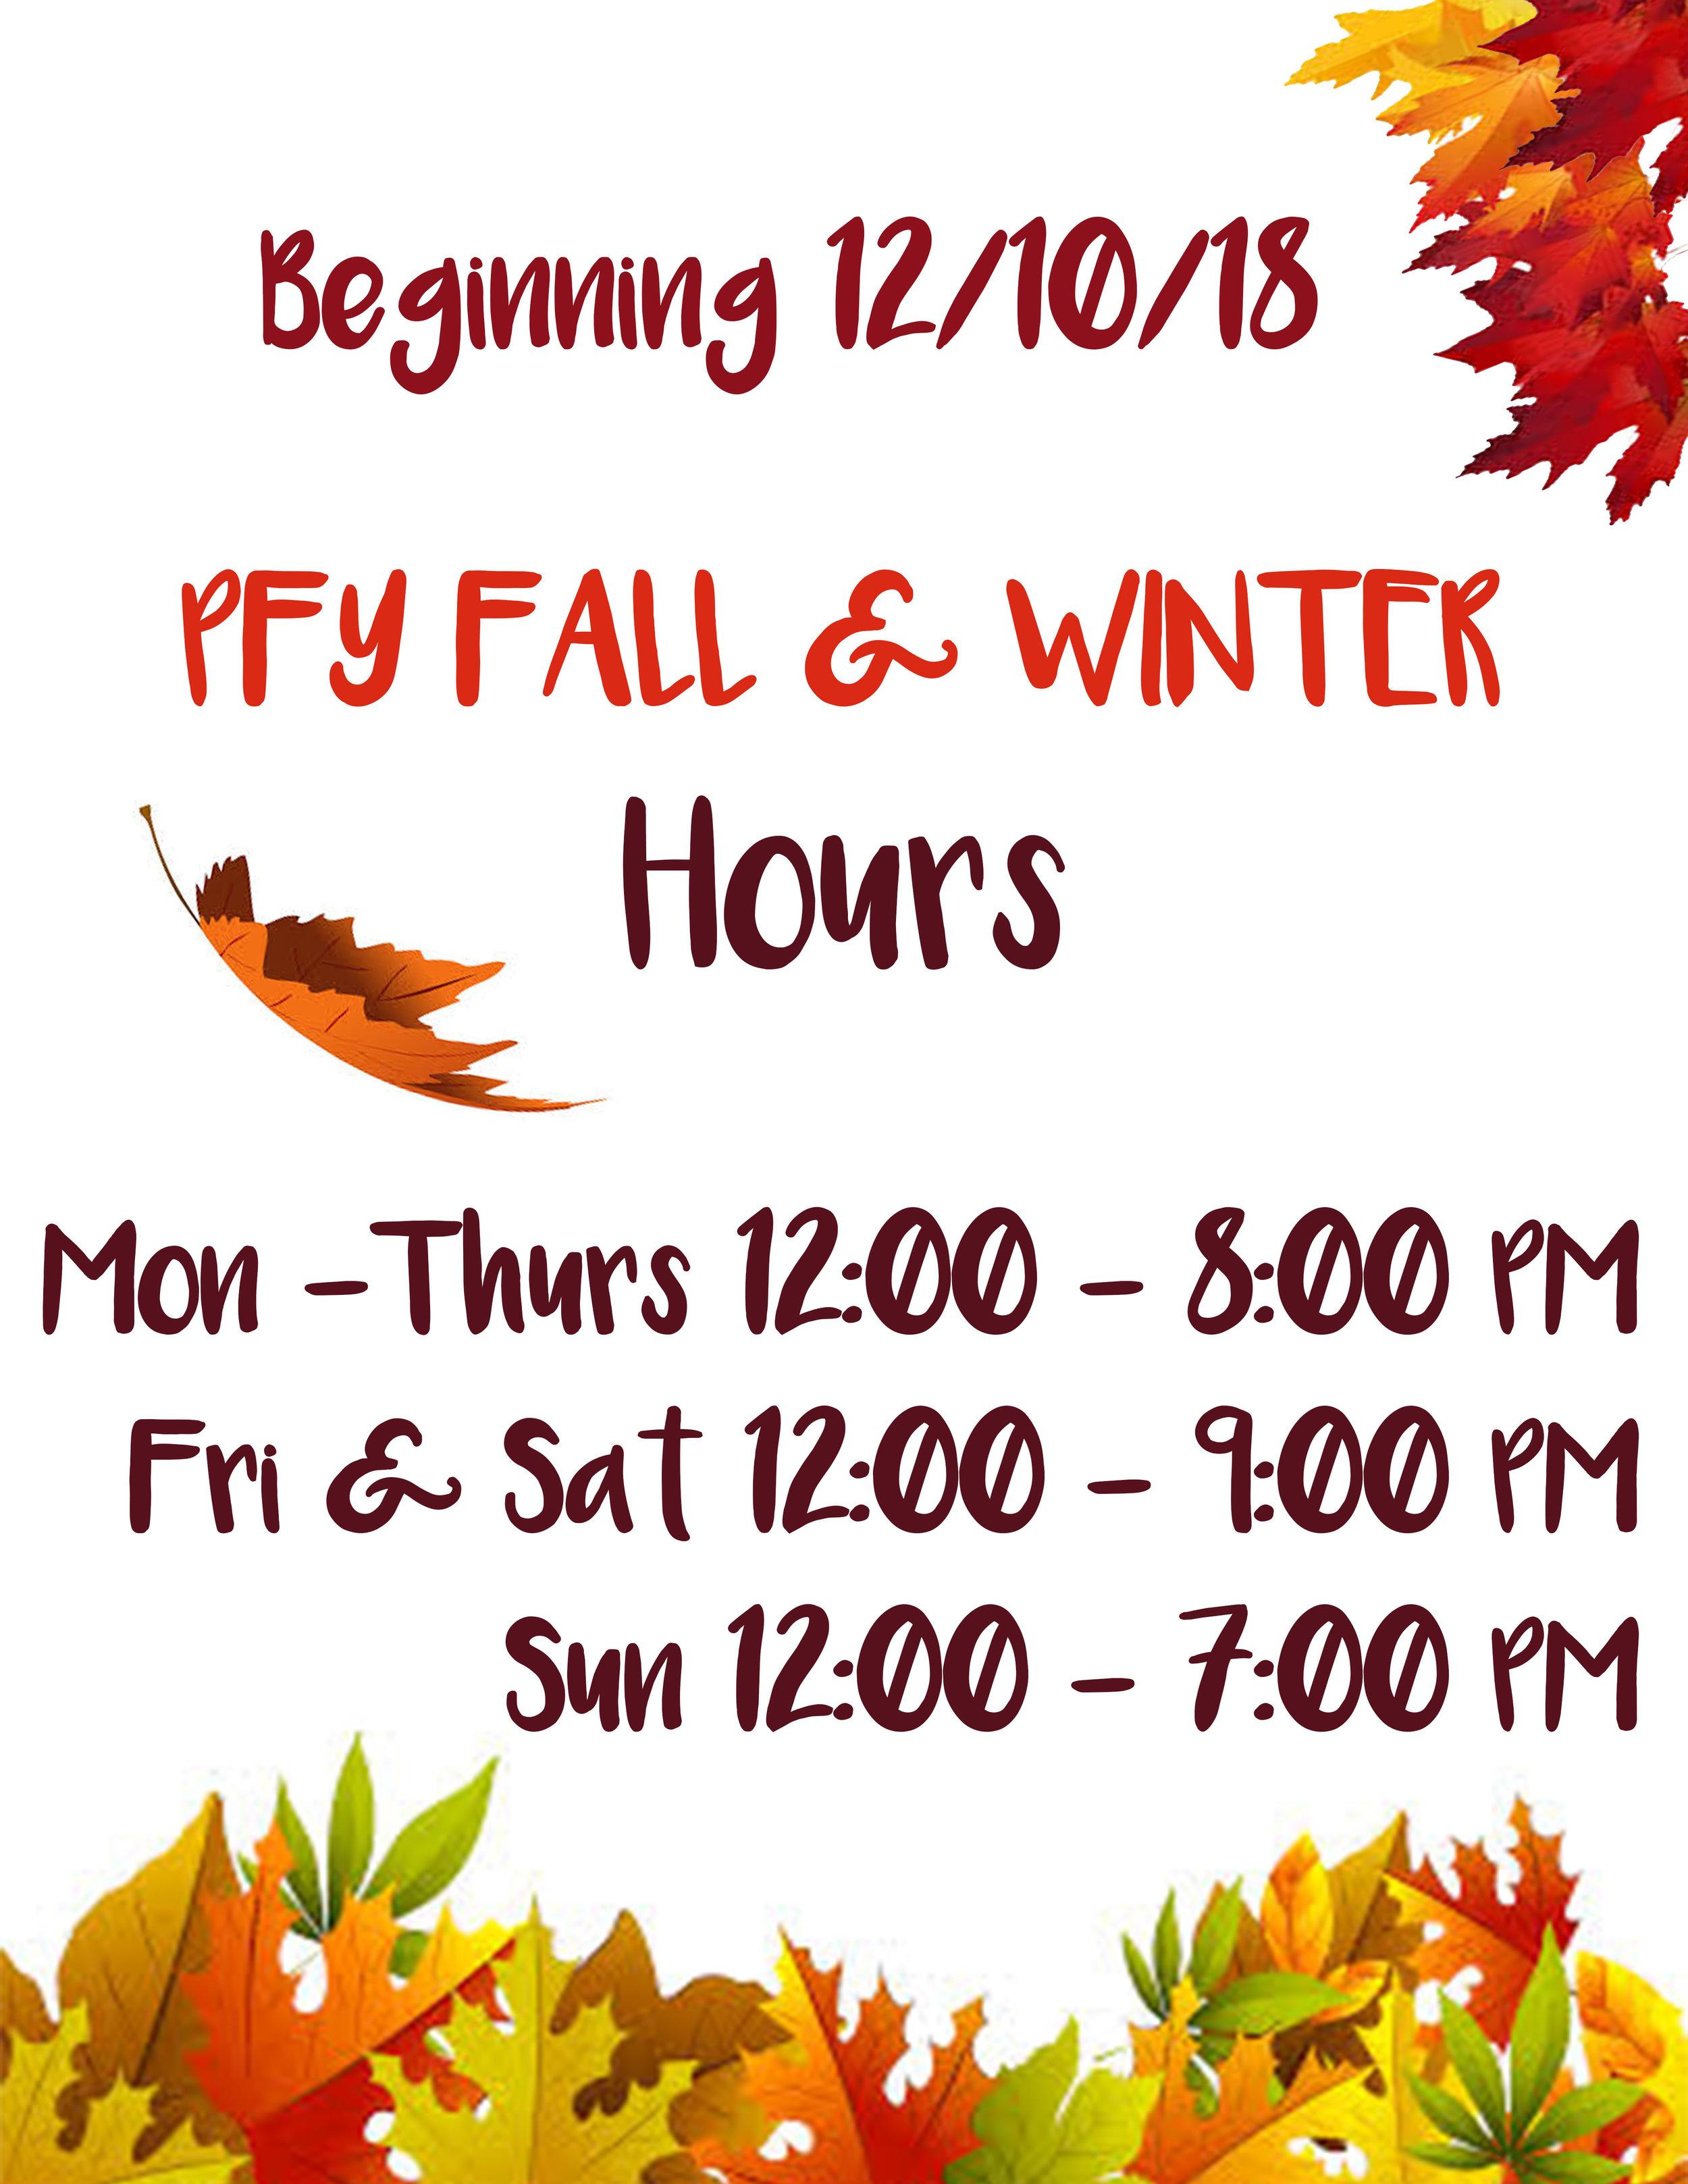 Fall_Winter_hours.jpg